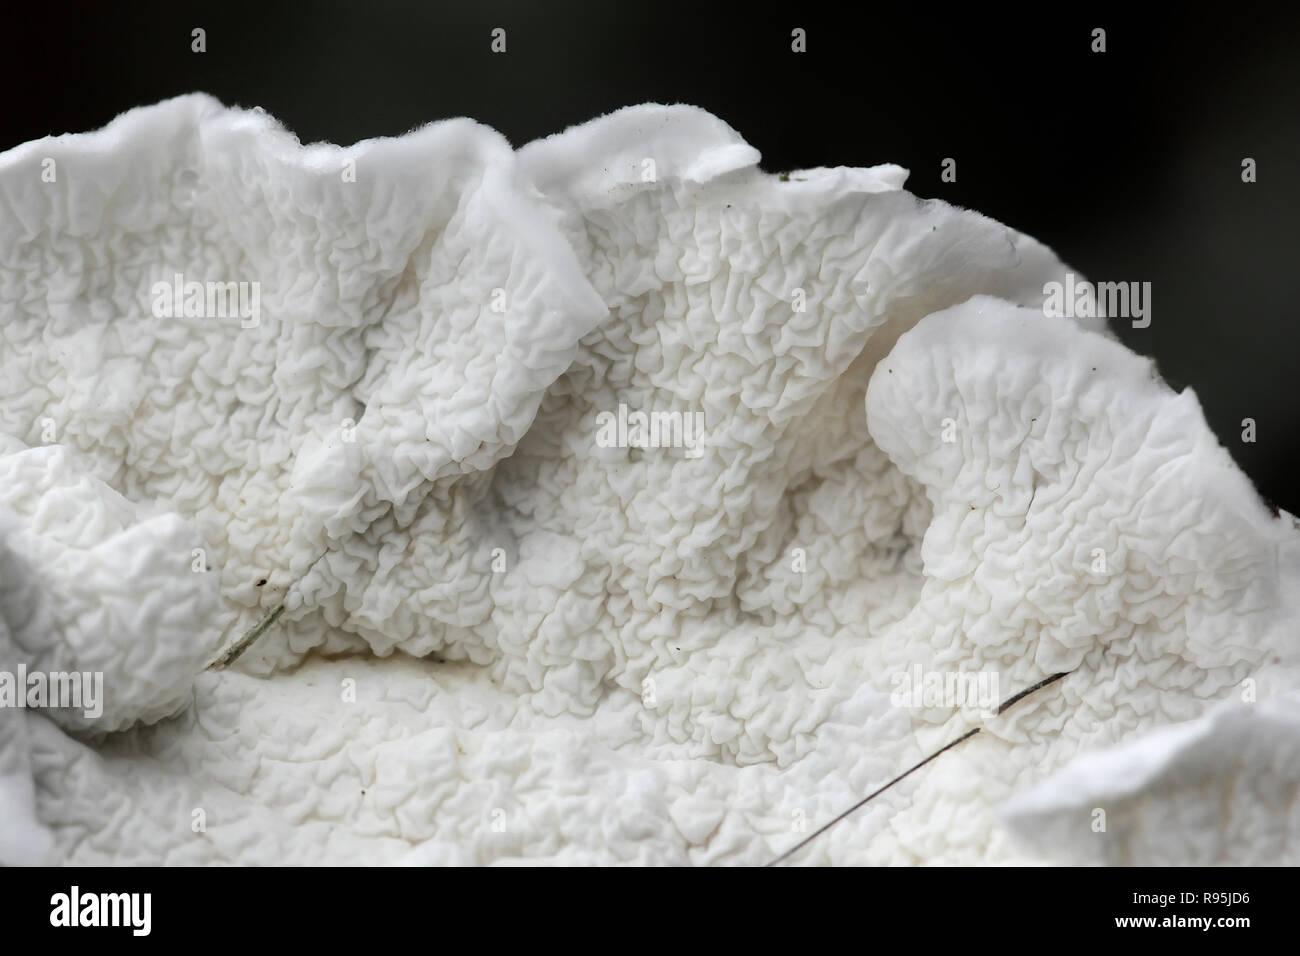 White soft texture of a fungus called Plicatura nivea - Stock Image